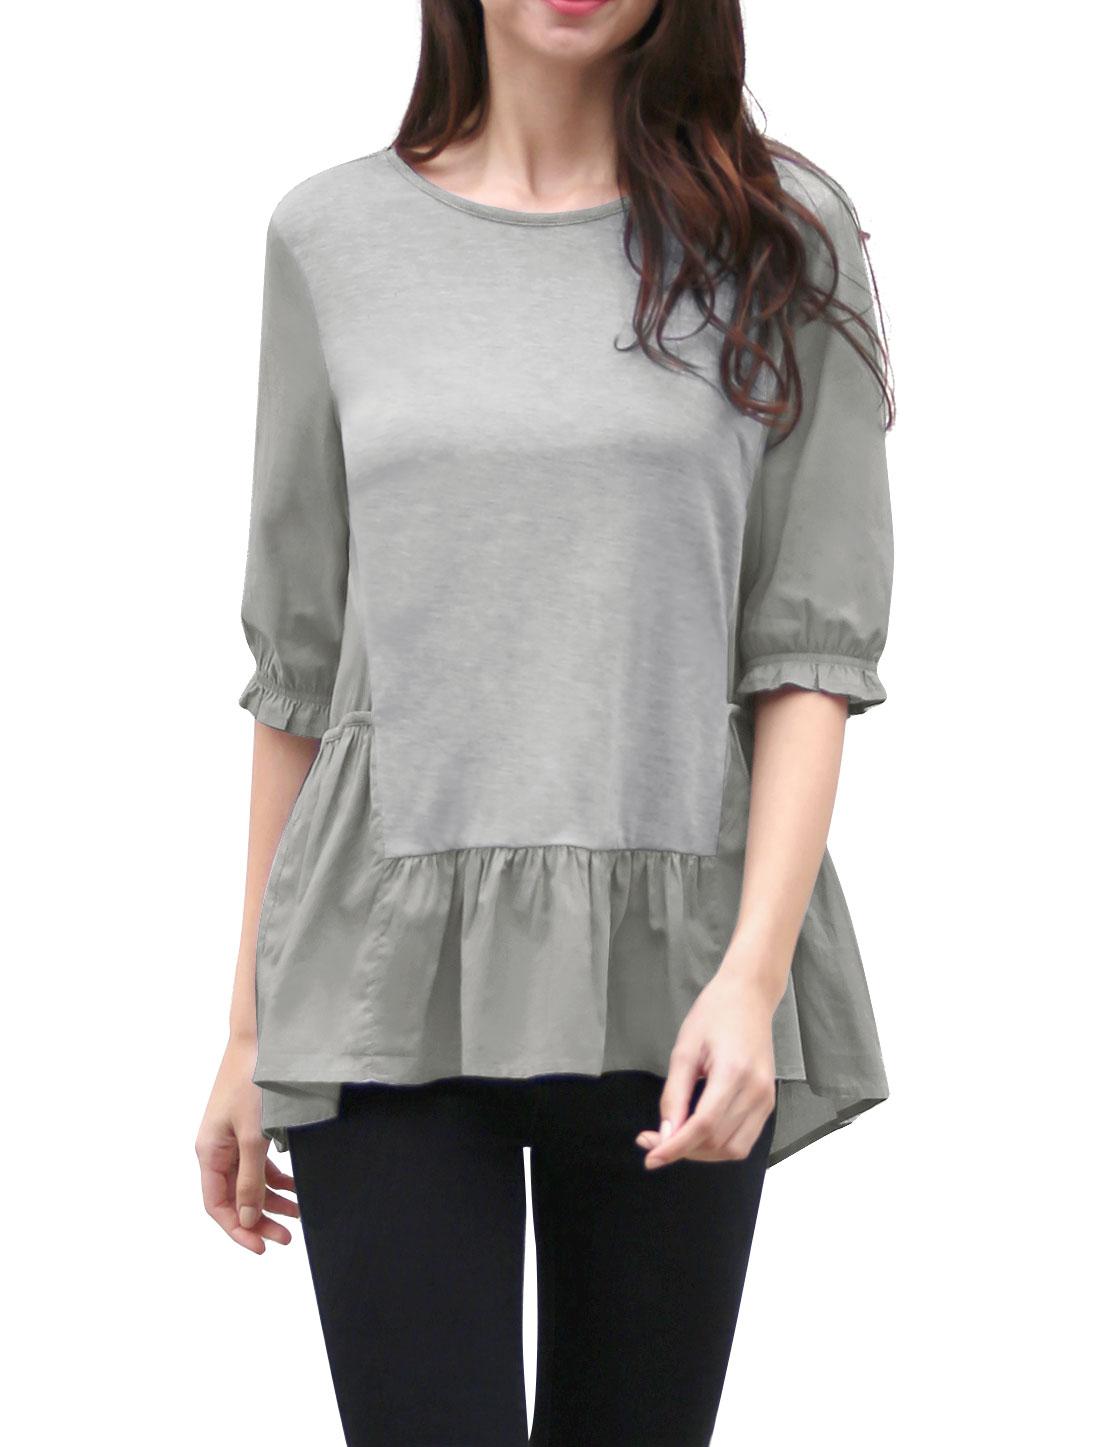 Women Ruffled High-Low Hem 1/2 Sleeves Paneled Tunic Top Gray S